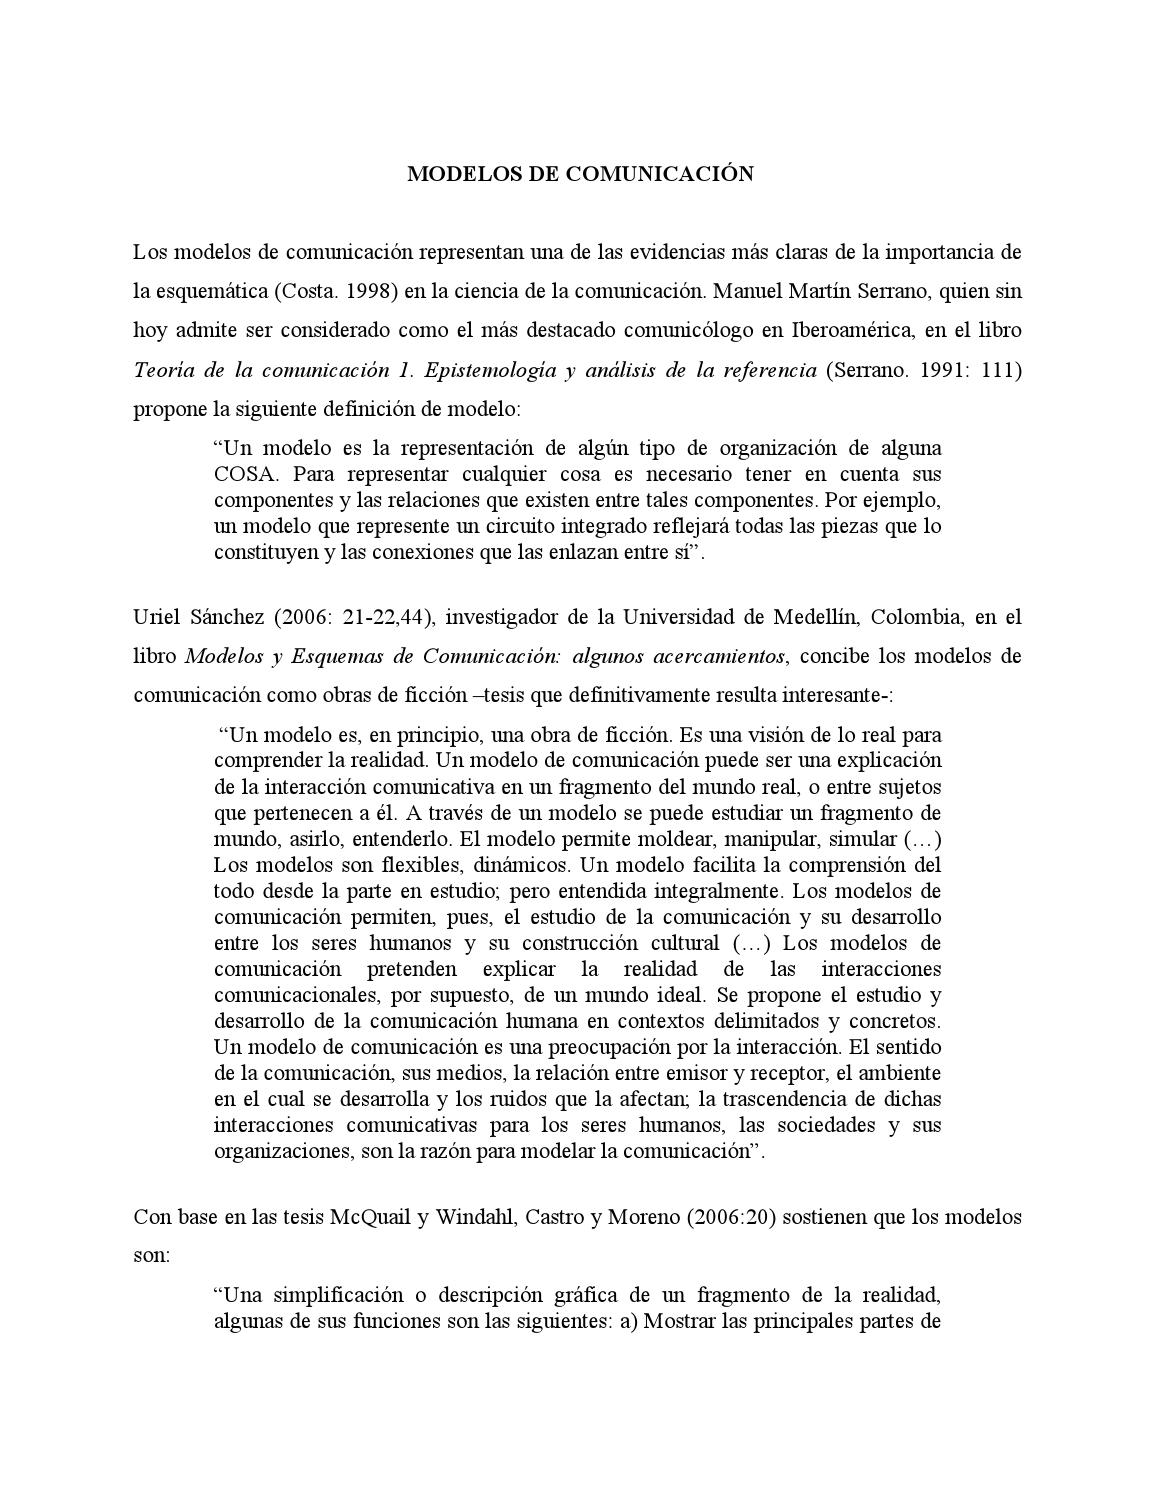 Modelos comunicacion by TheGabean - issuu